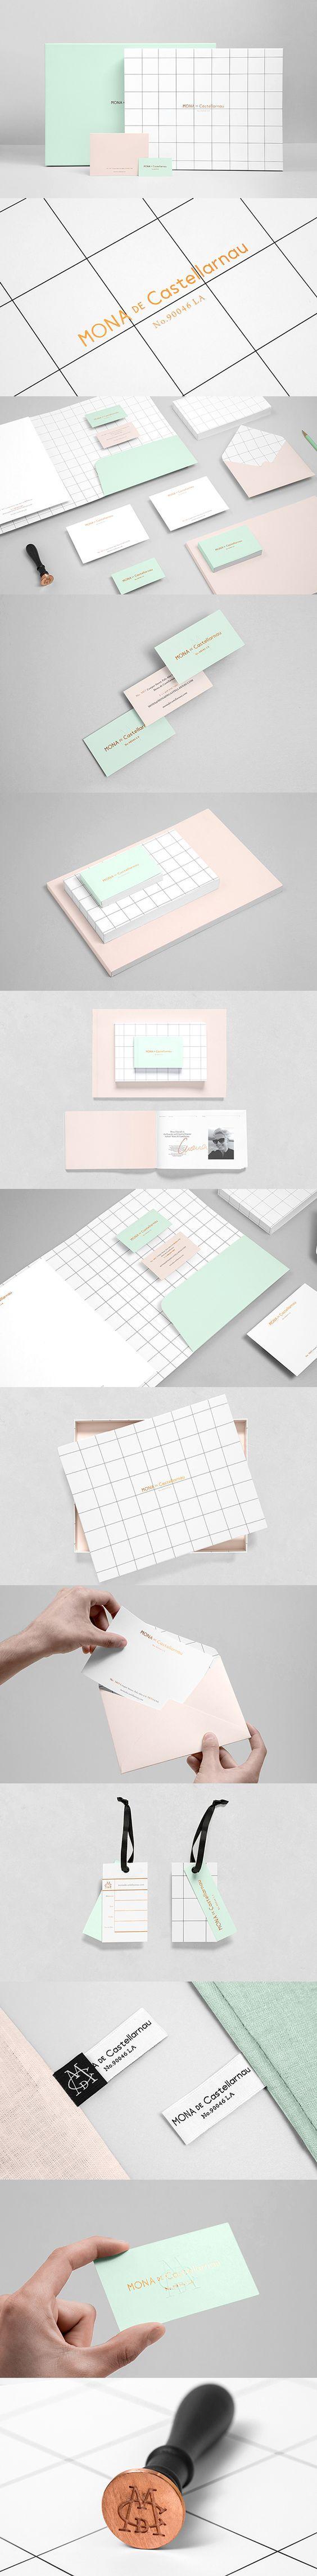 Mona De Castellarnau Home Accessories Branding by Anagrama Studio   Fivestar Branding Agency – Design and Branding Agency & Curated Inspiration Gallery